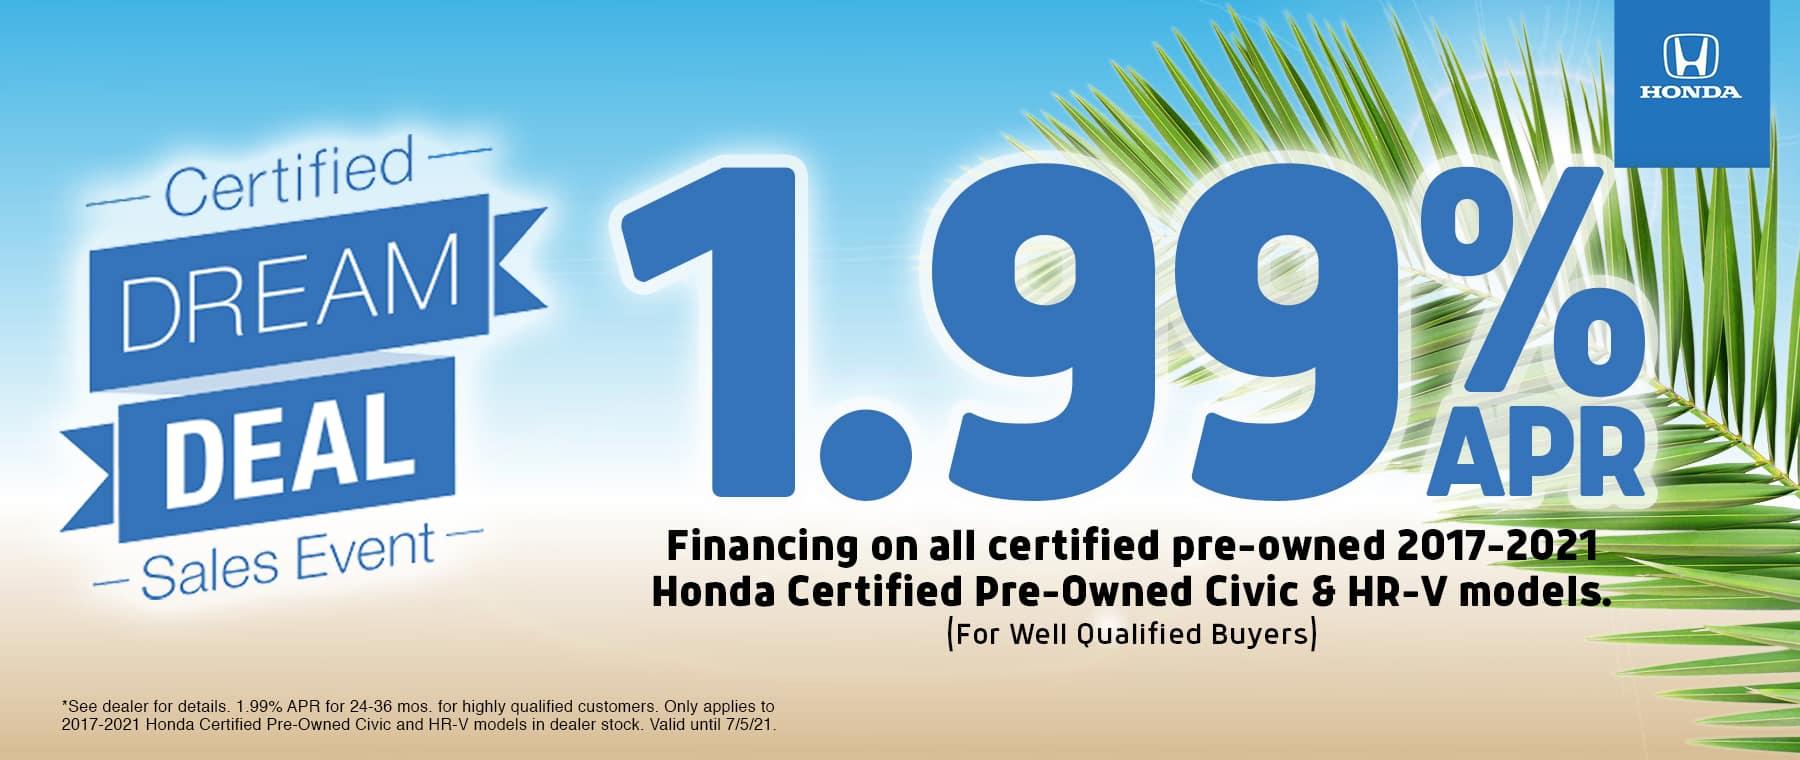 Hendrick-Honda-S-Blvd—Certified-Dream-Deal—summer-June21_TR-1800X760